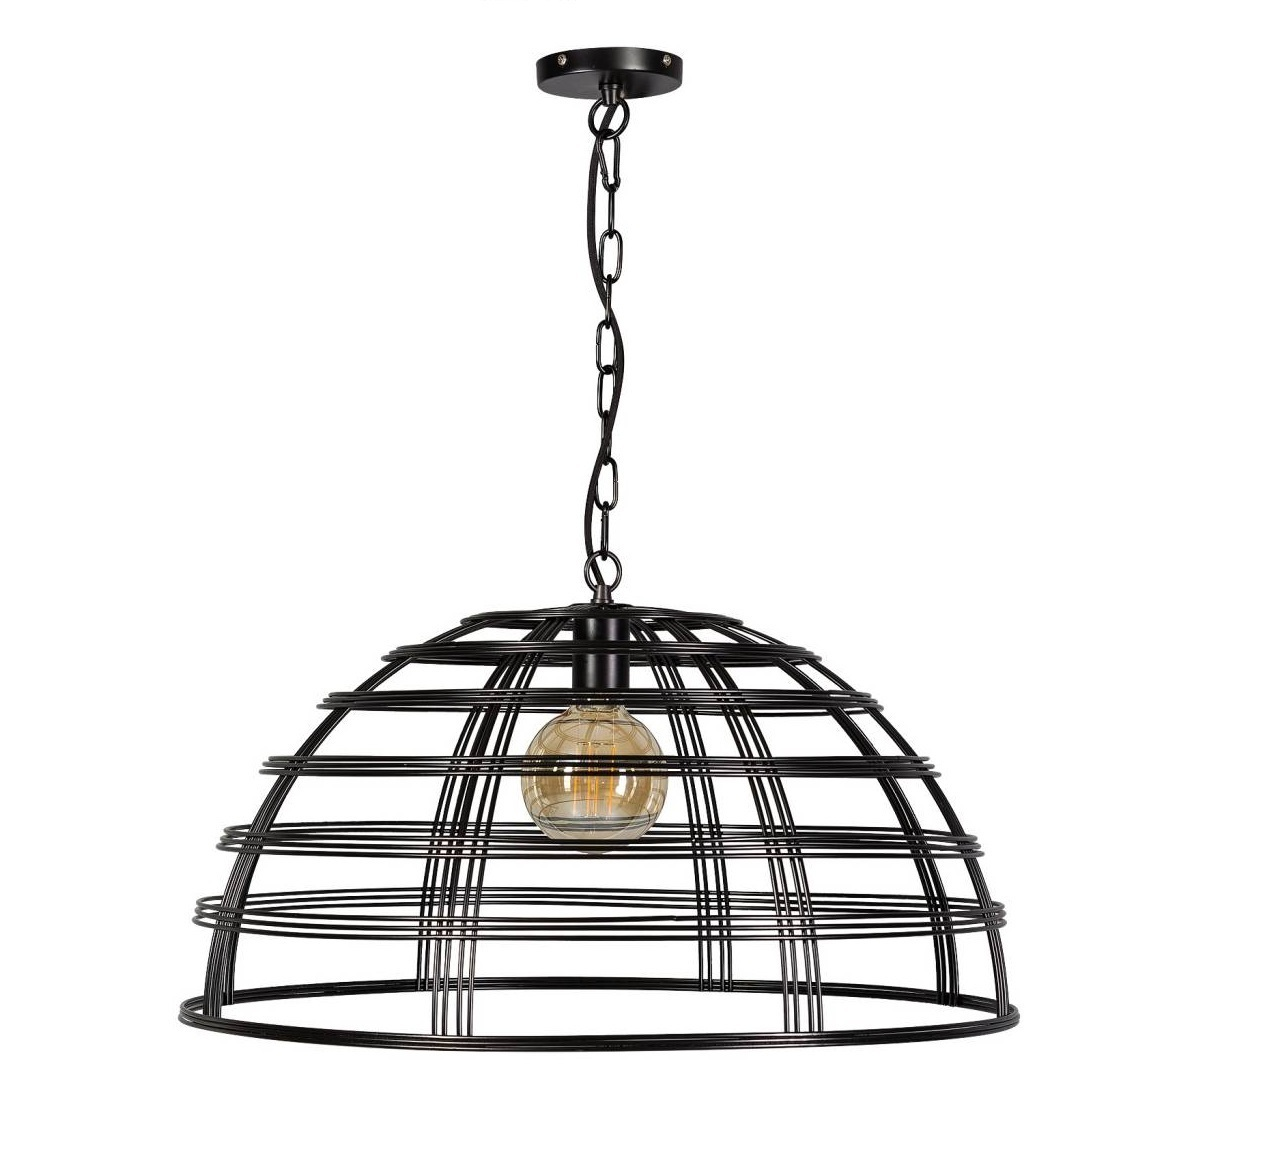 Hanglamp Barletta zwart groot